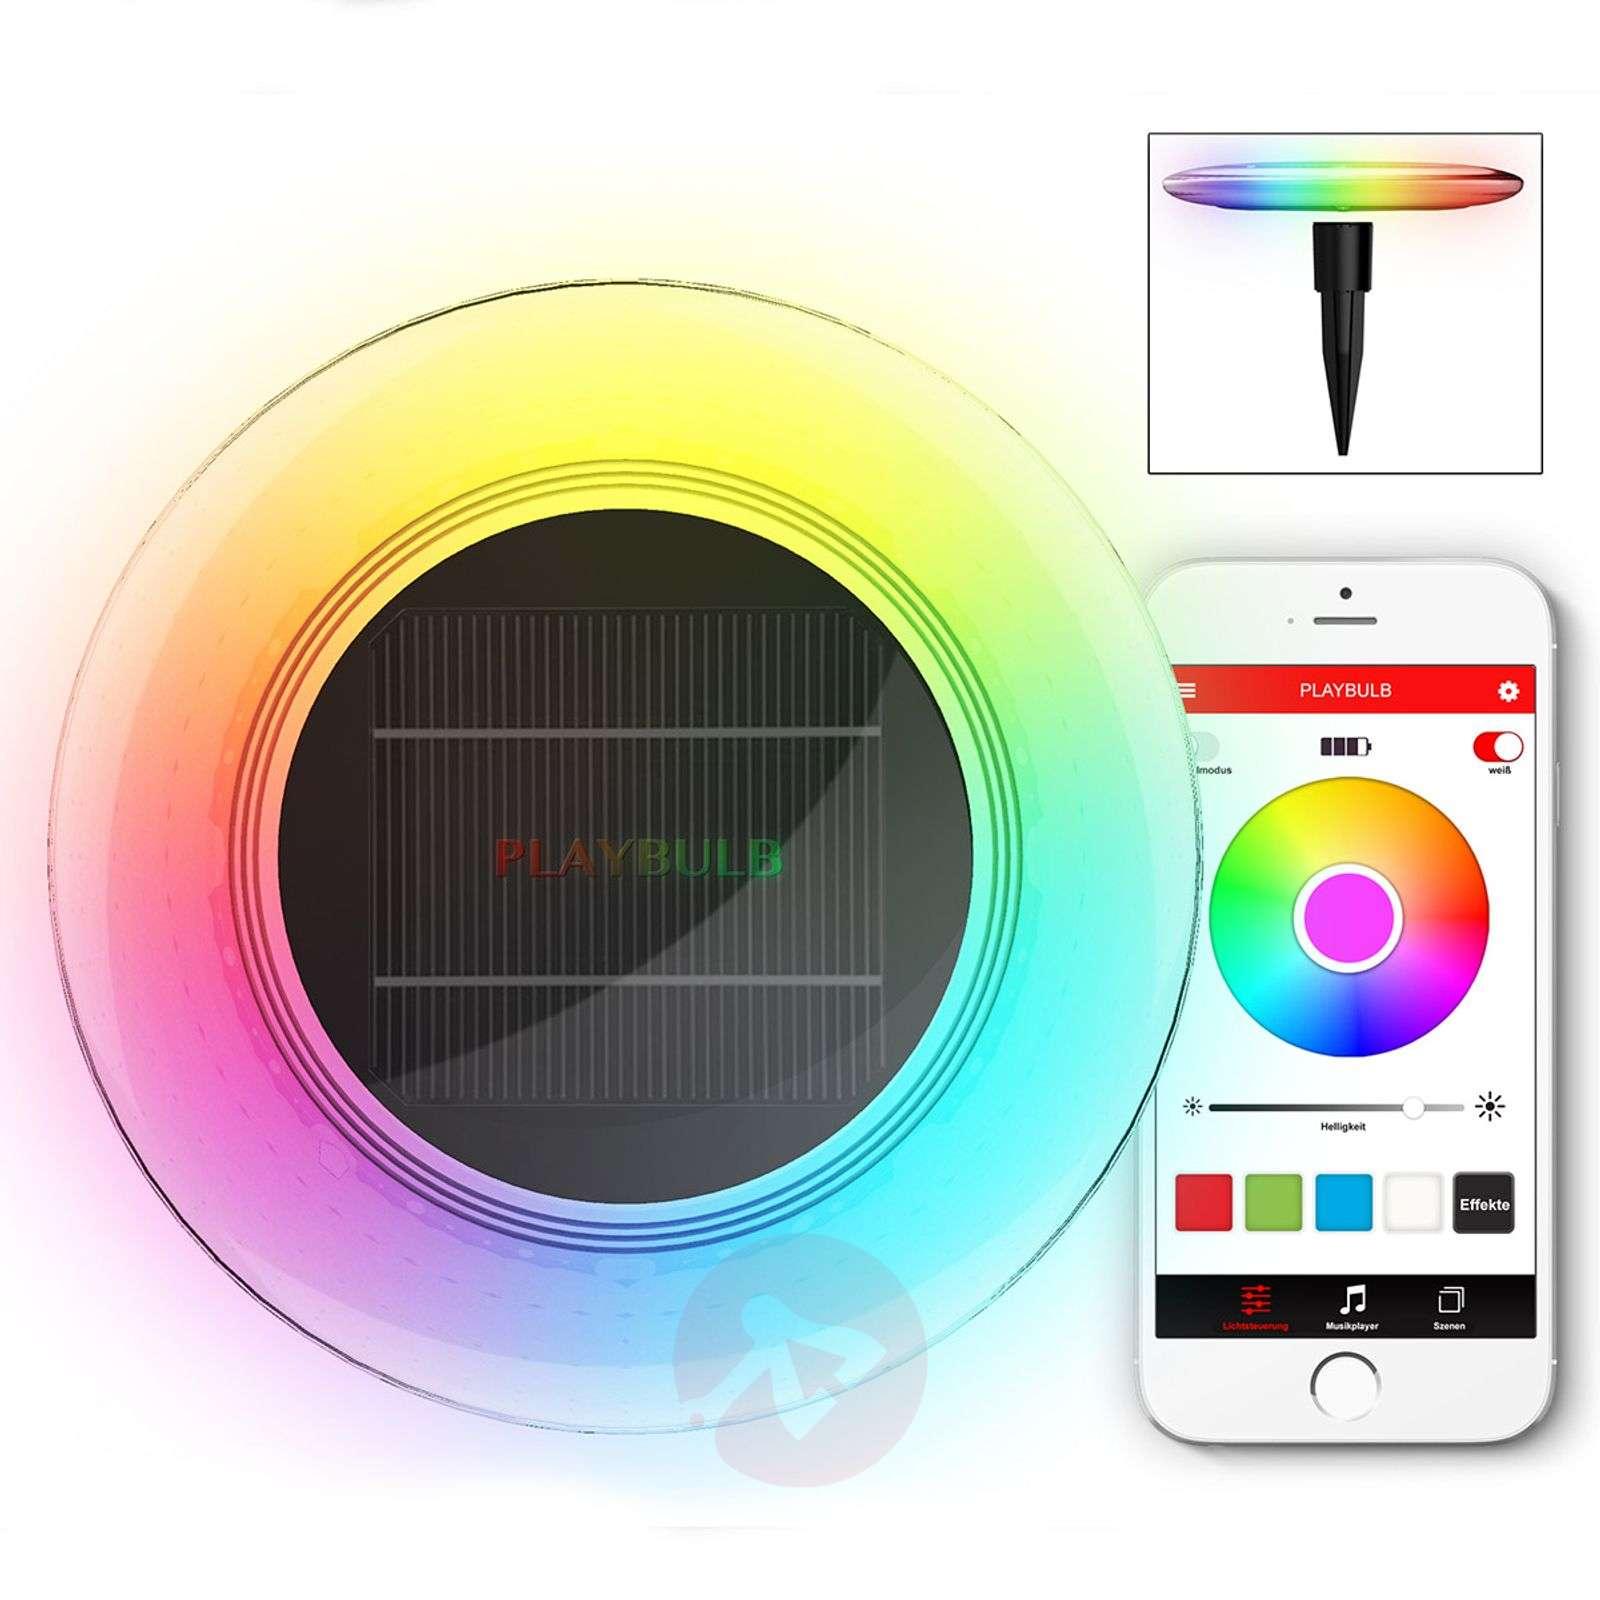 MiPow Playbulb Solar LED decorative light set of 3-5543021-01